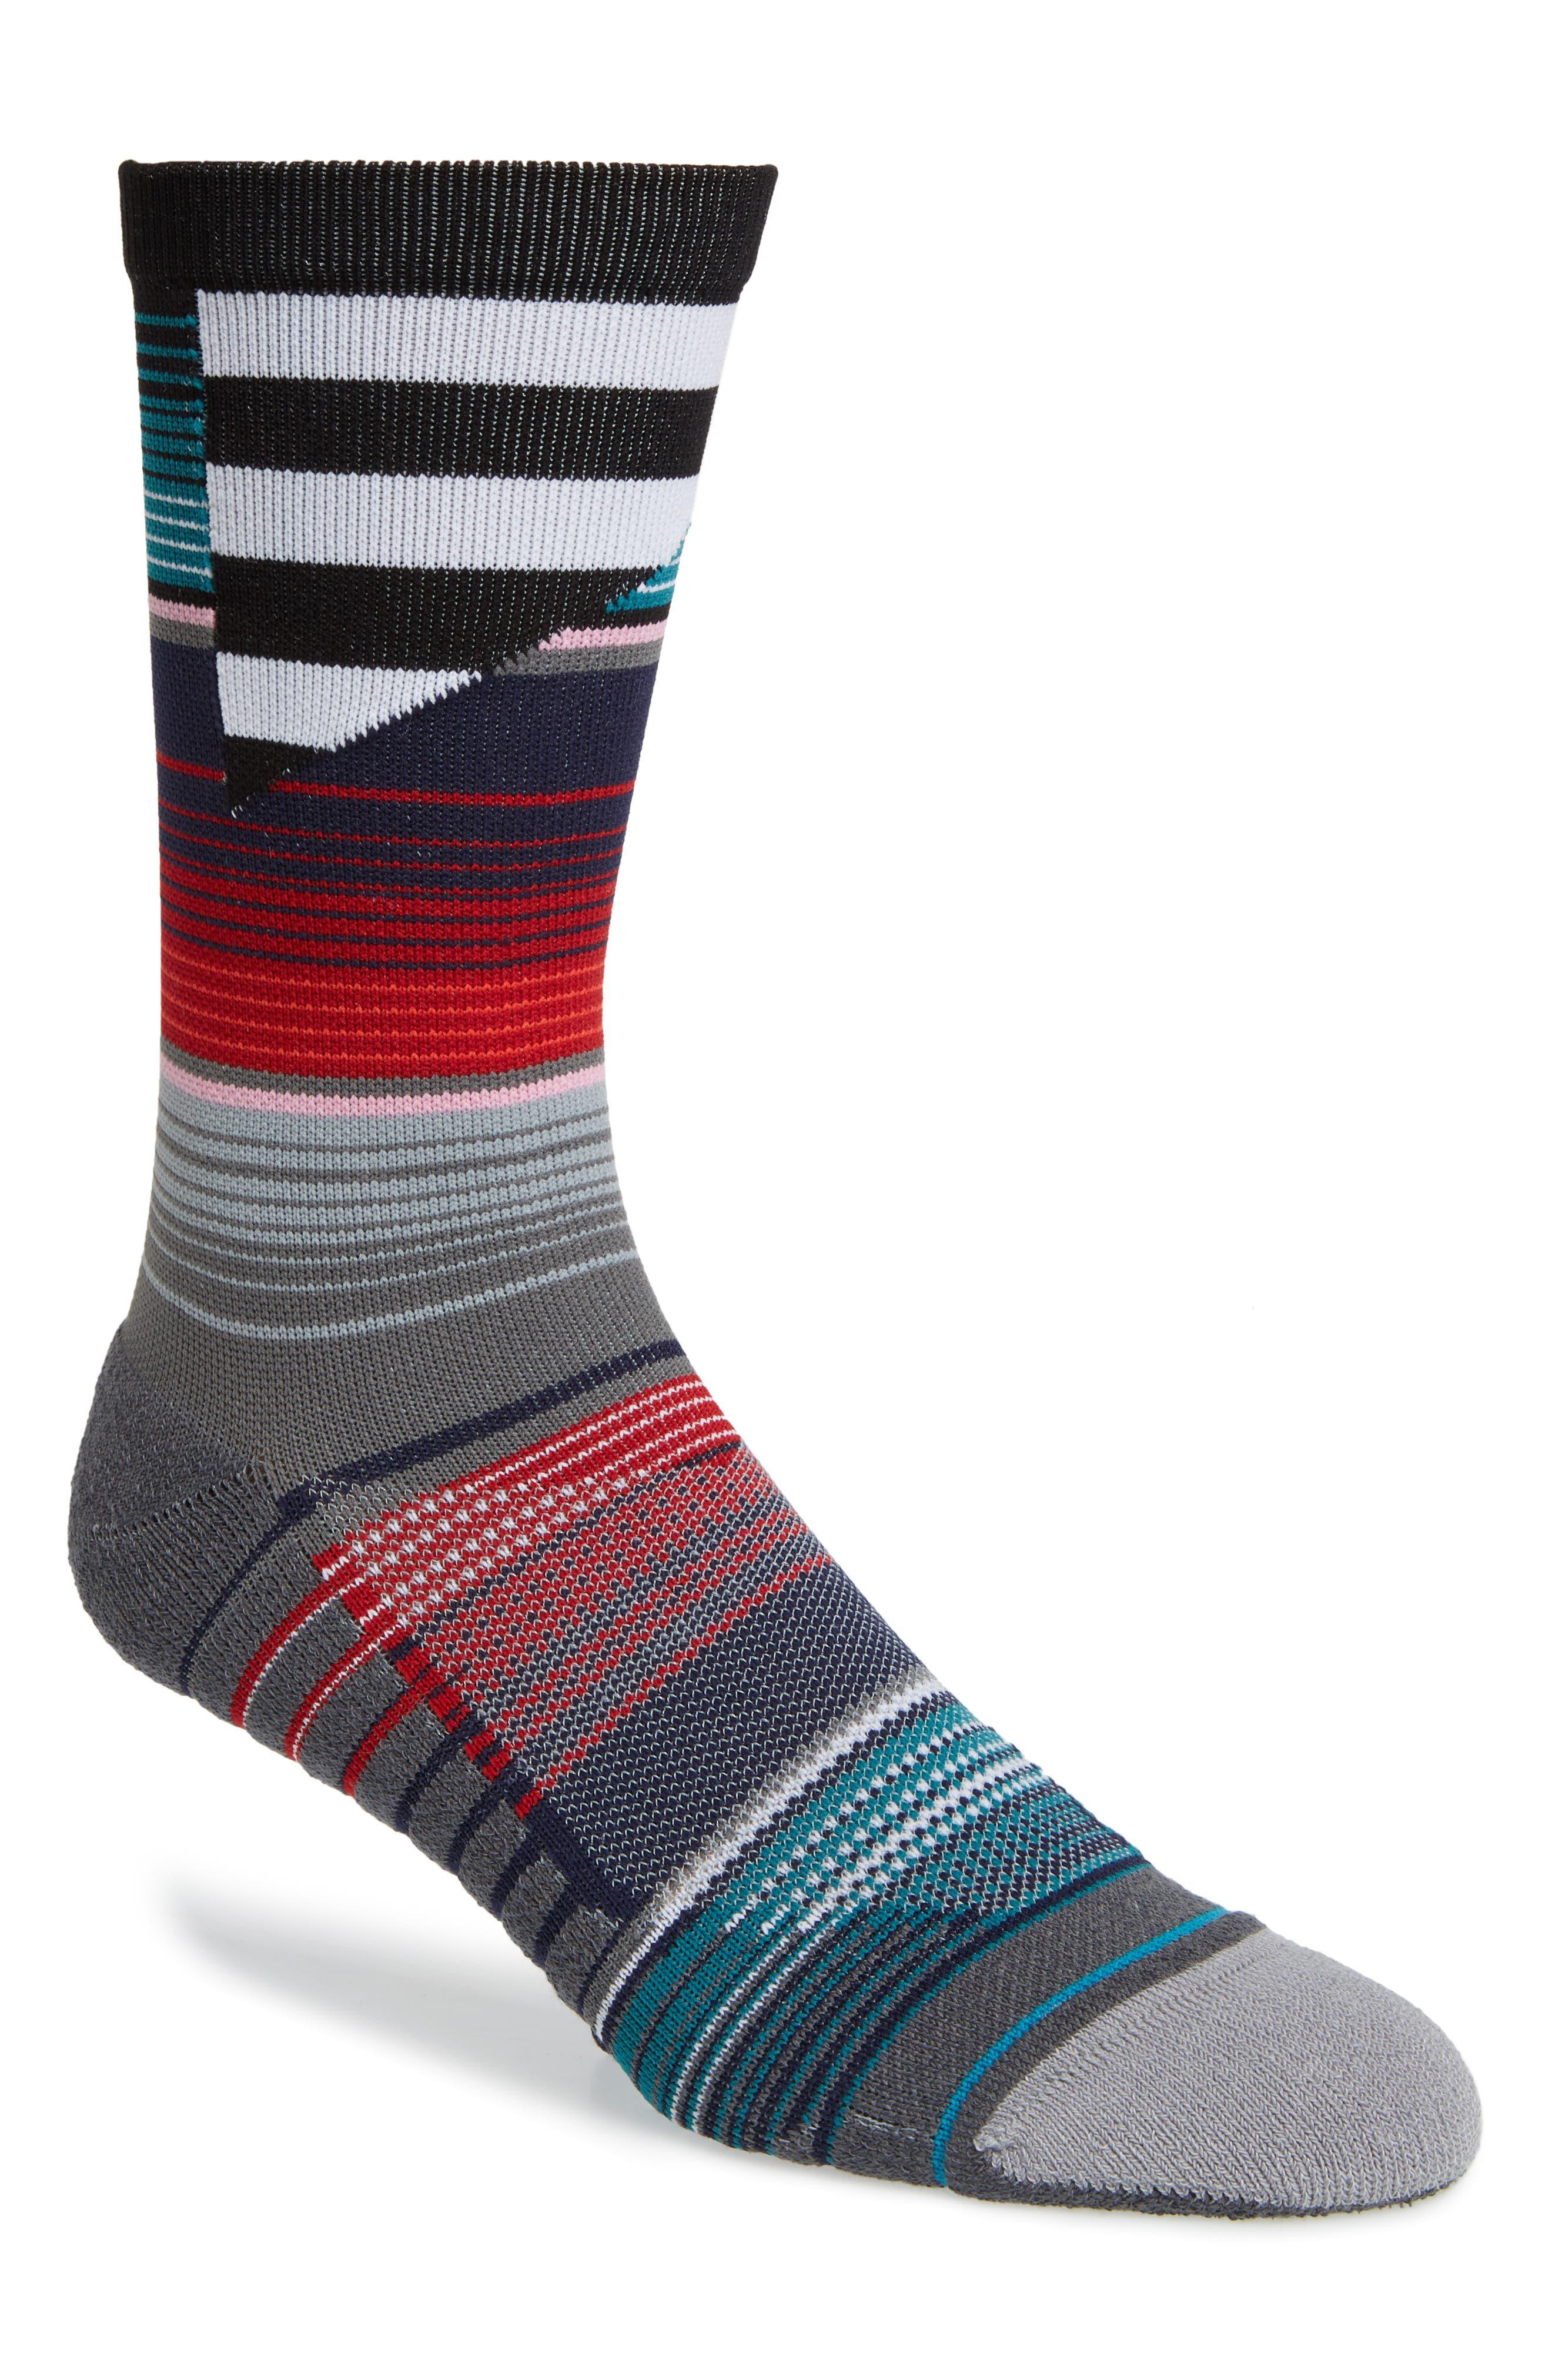 Barder Crew Socks,                         Main,                         color, RED MULTI